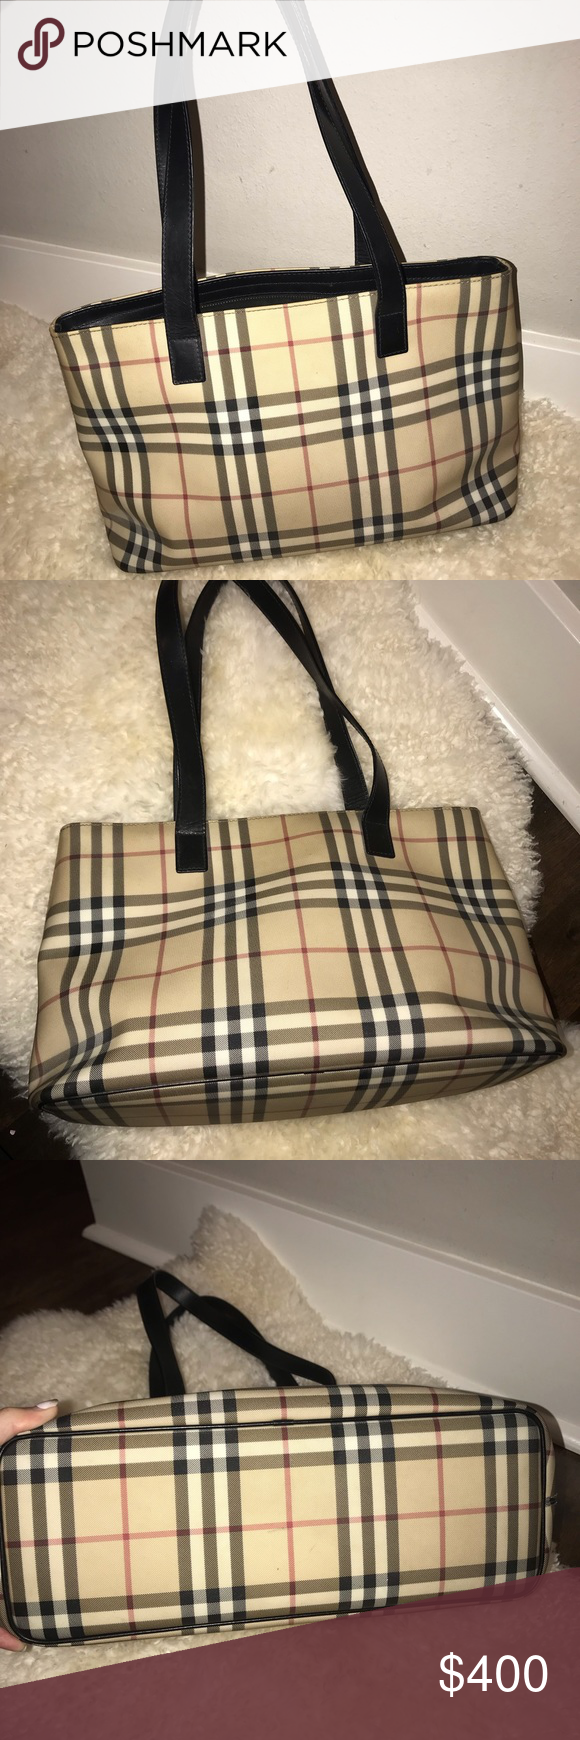 a59b29dd427 Authentic Burberry Tote/shoulder bag 🔅Beige and multicolor Nova check  canvas Burberry mini tote